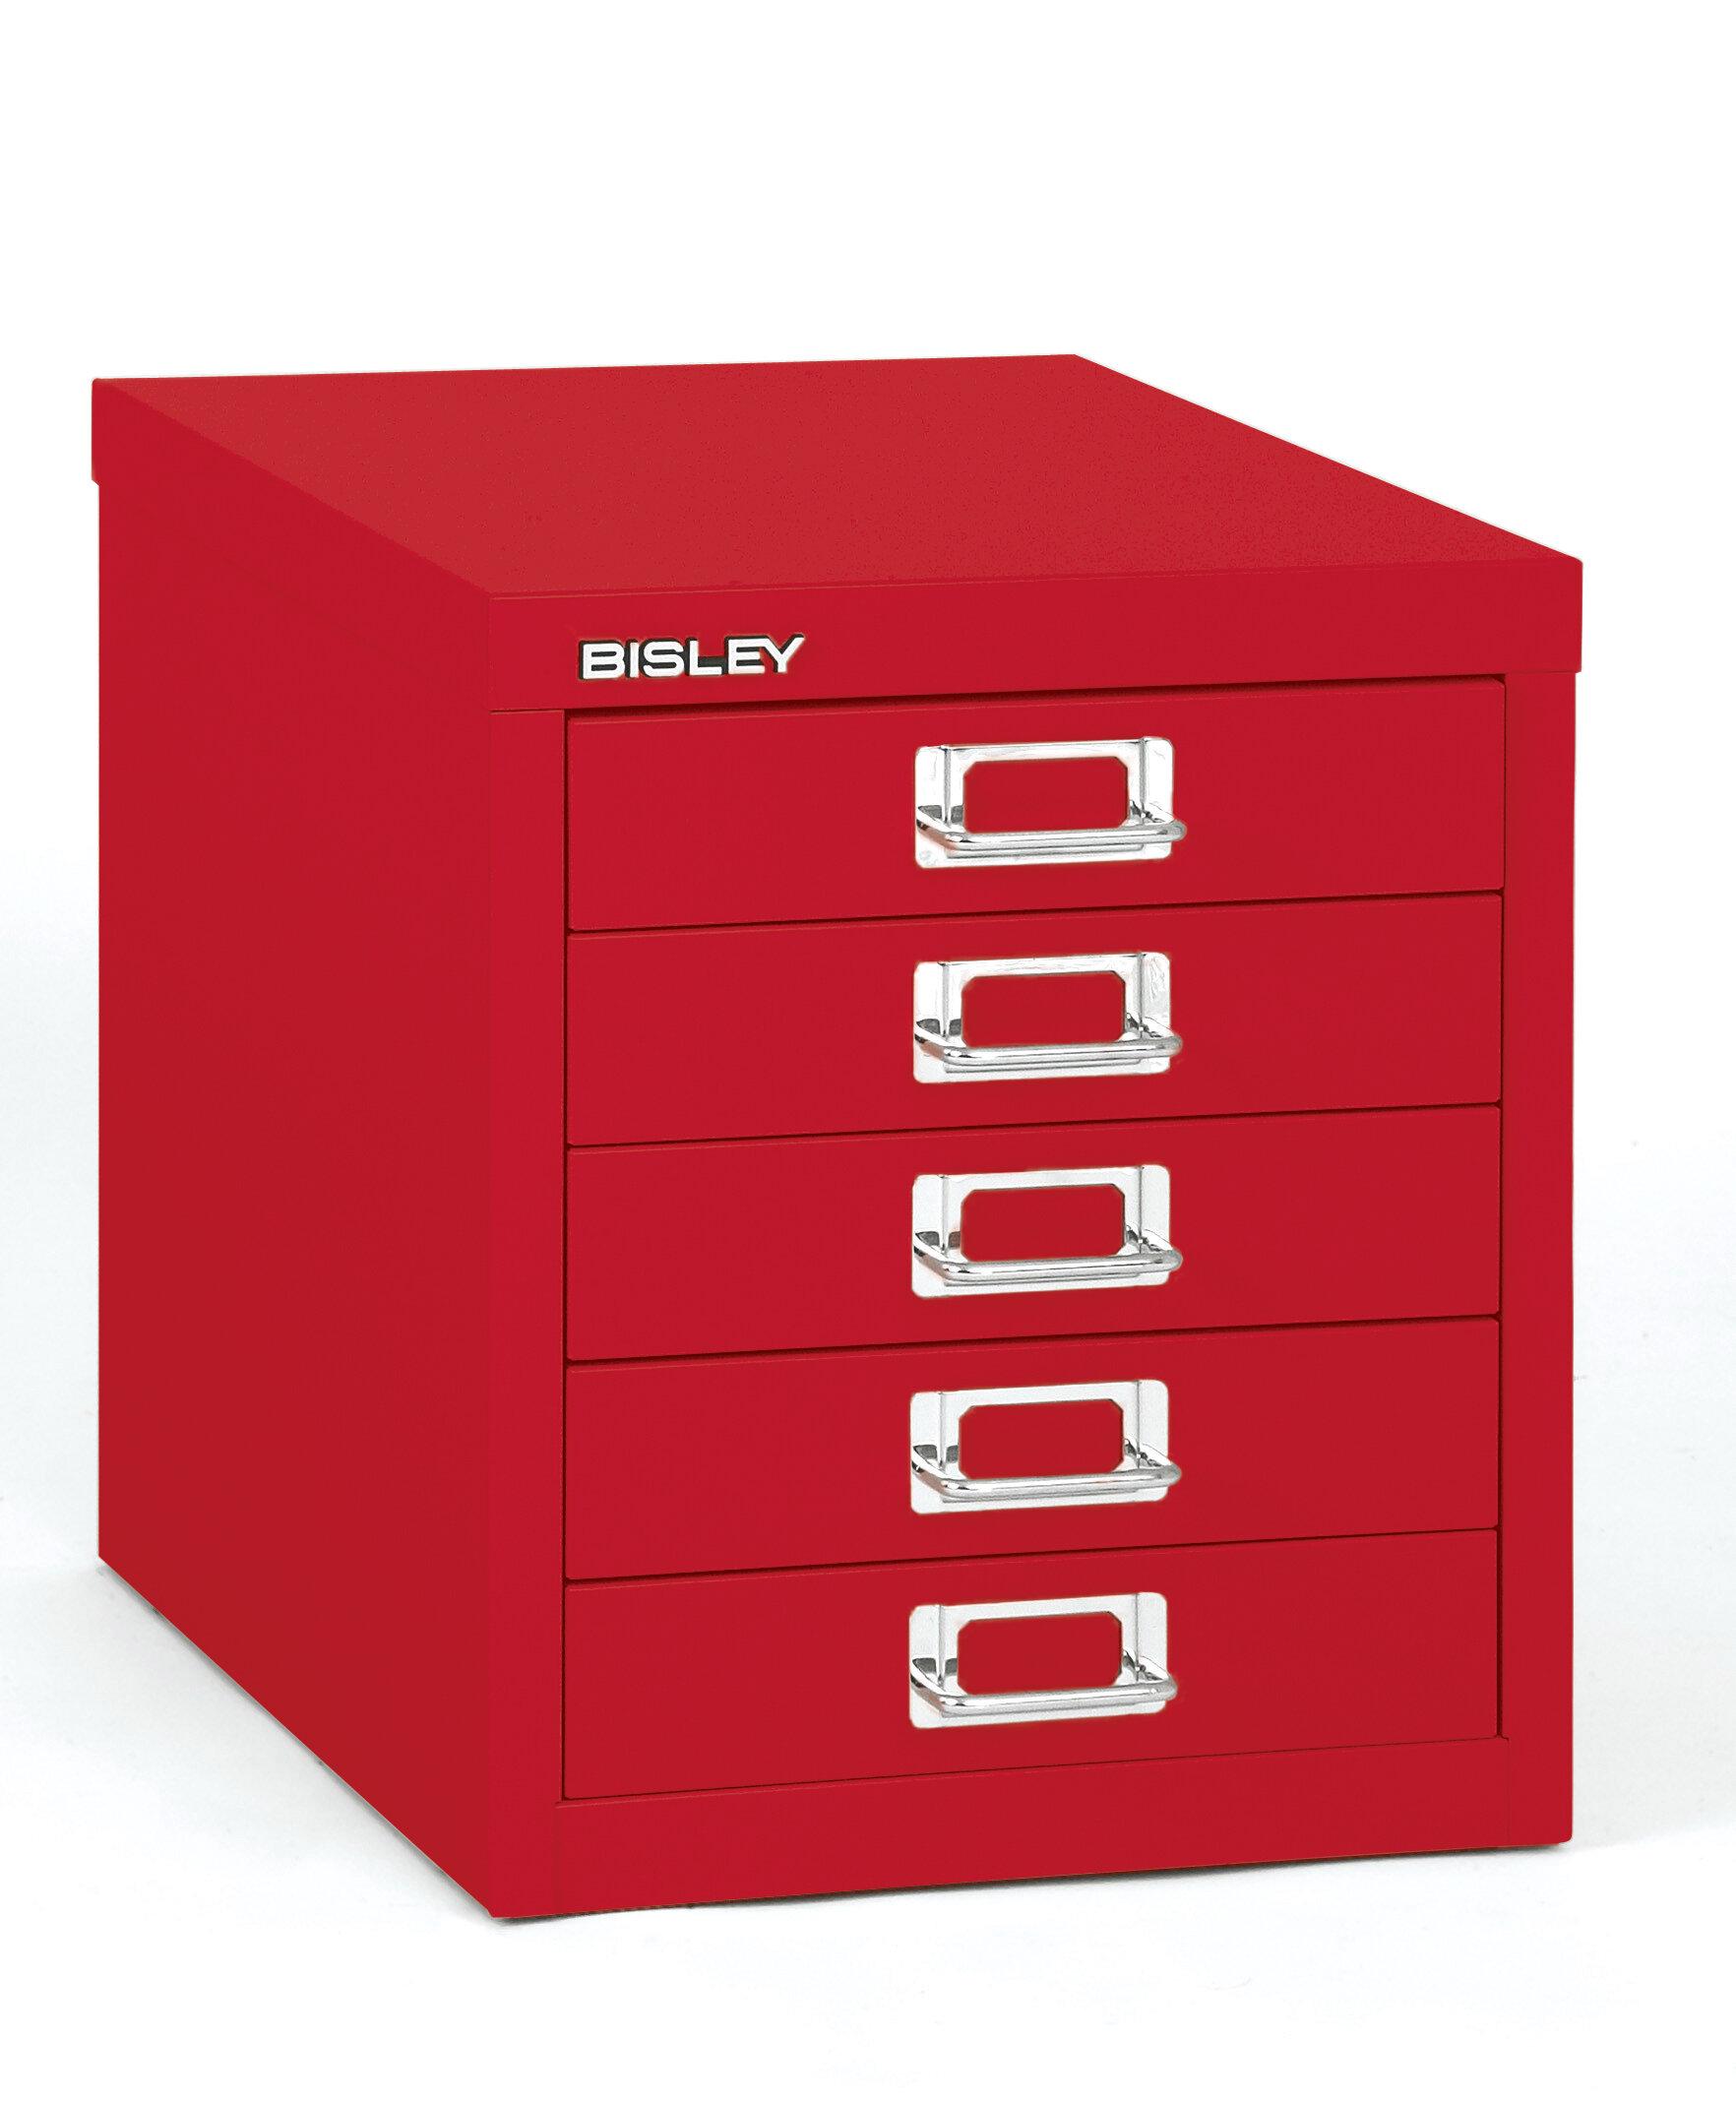 Bisley 5 Drawer Vertical Filing Cabinet | Wayfair